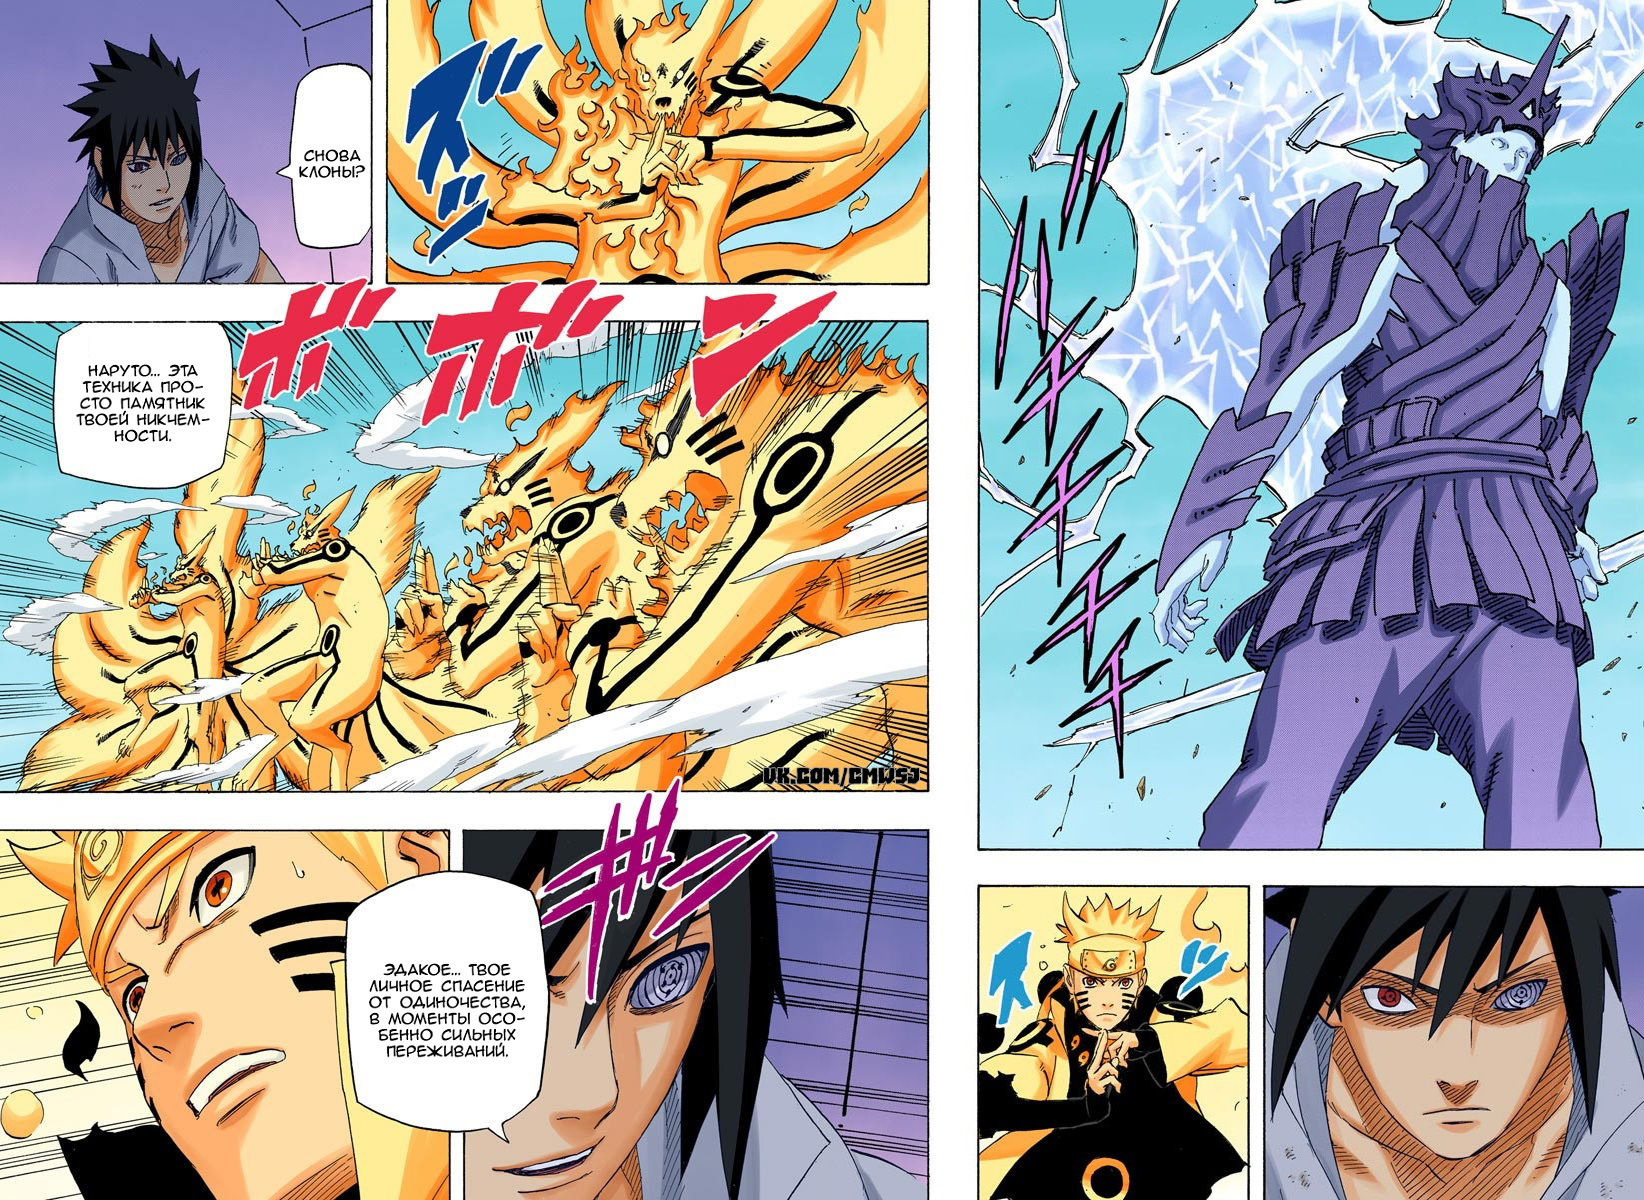 Anime Fight Characters 0 1 : Файл Гедо Сусаноо anime characters fight вики